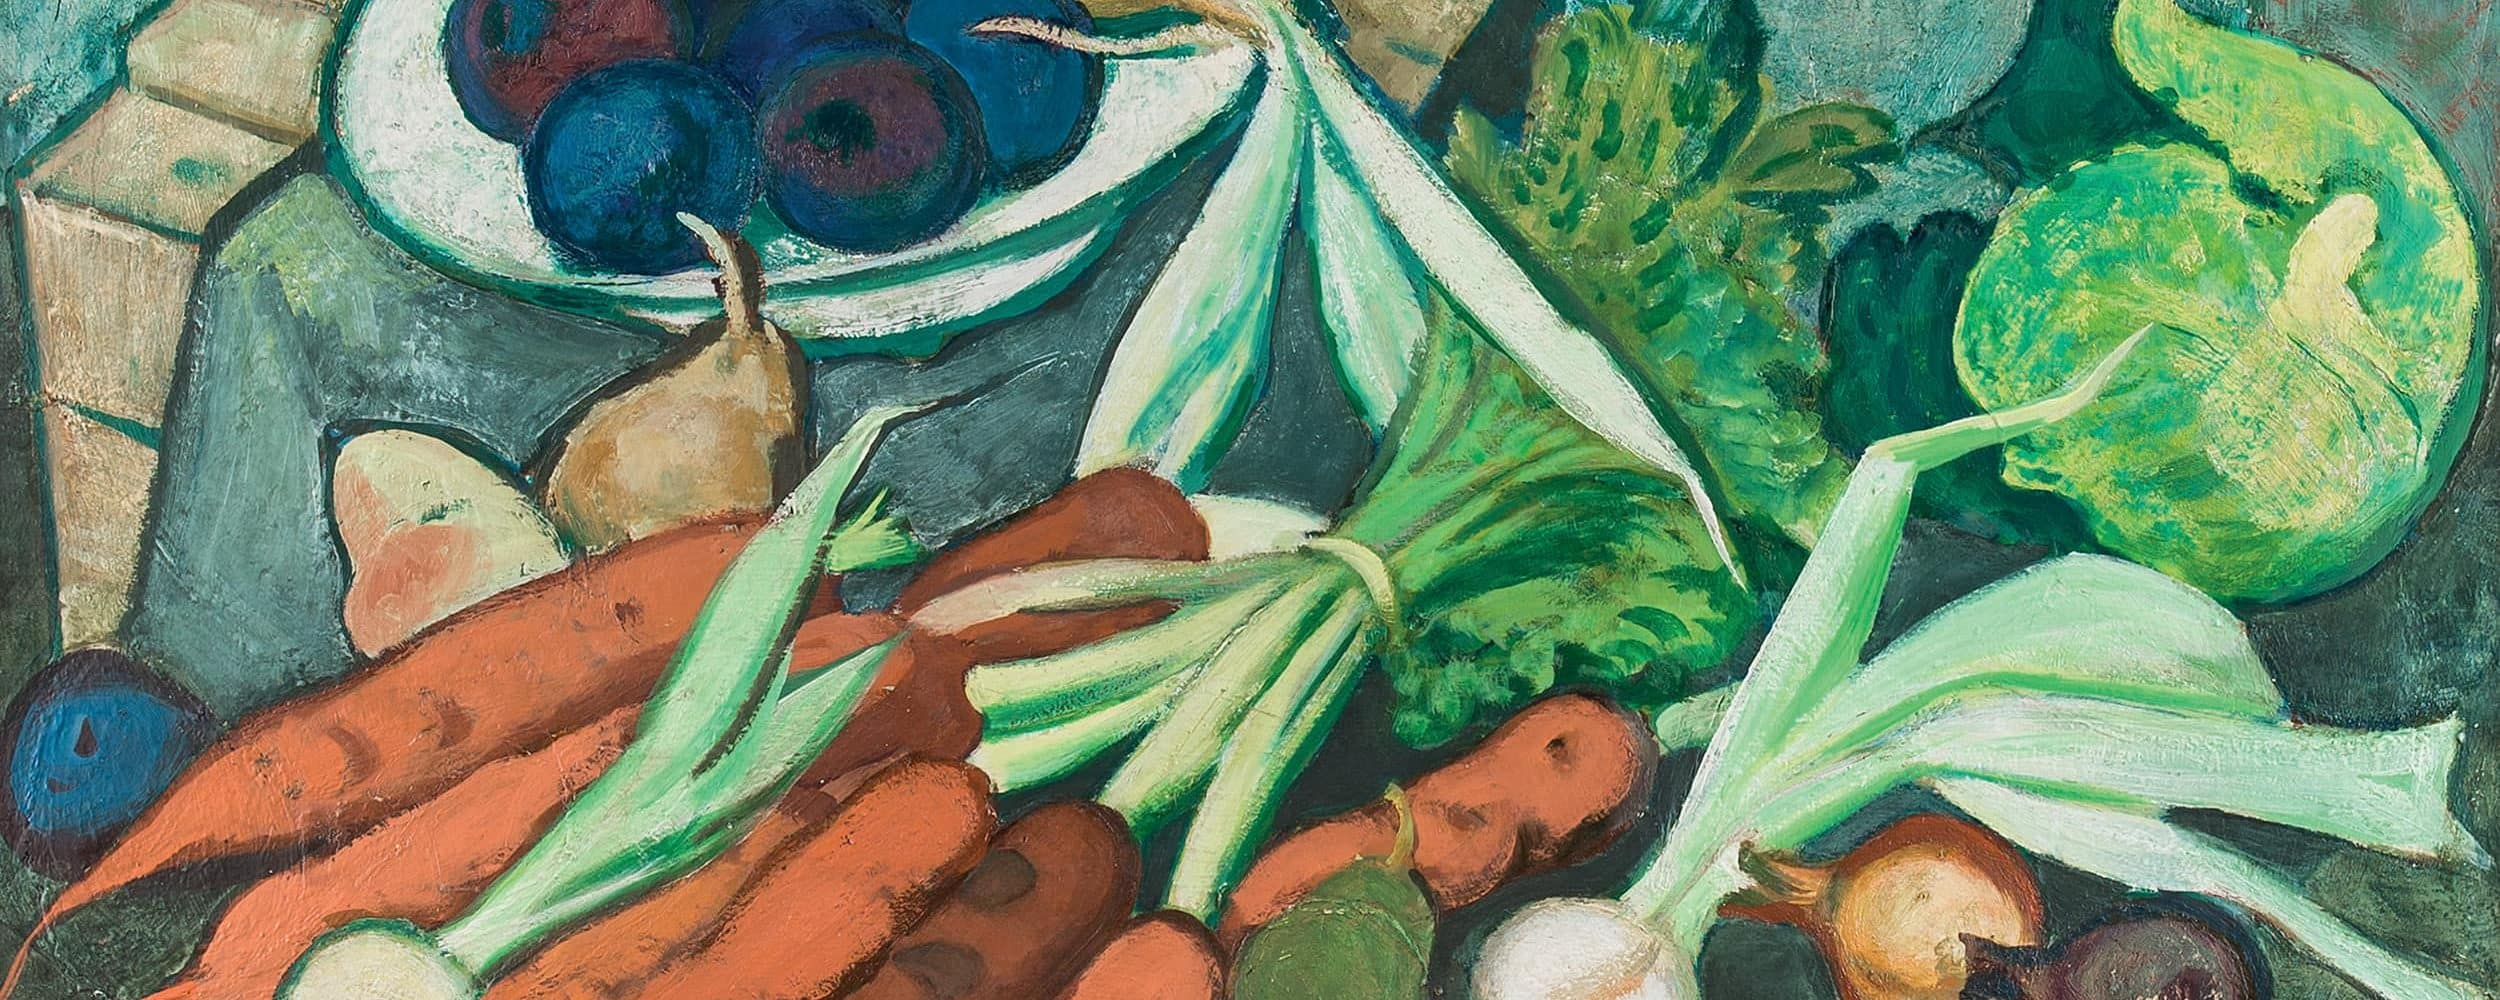 Gemüsestillleben | 1960